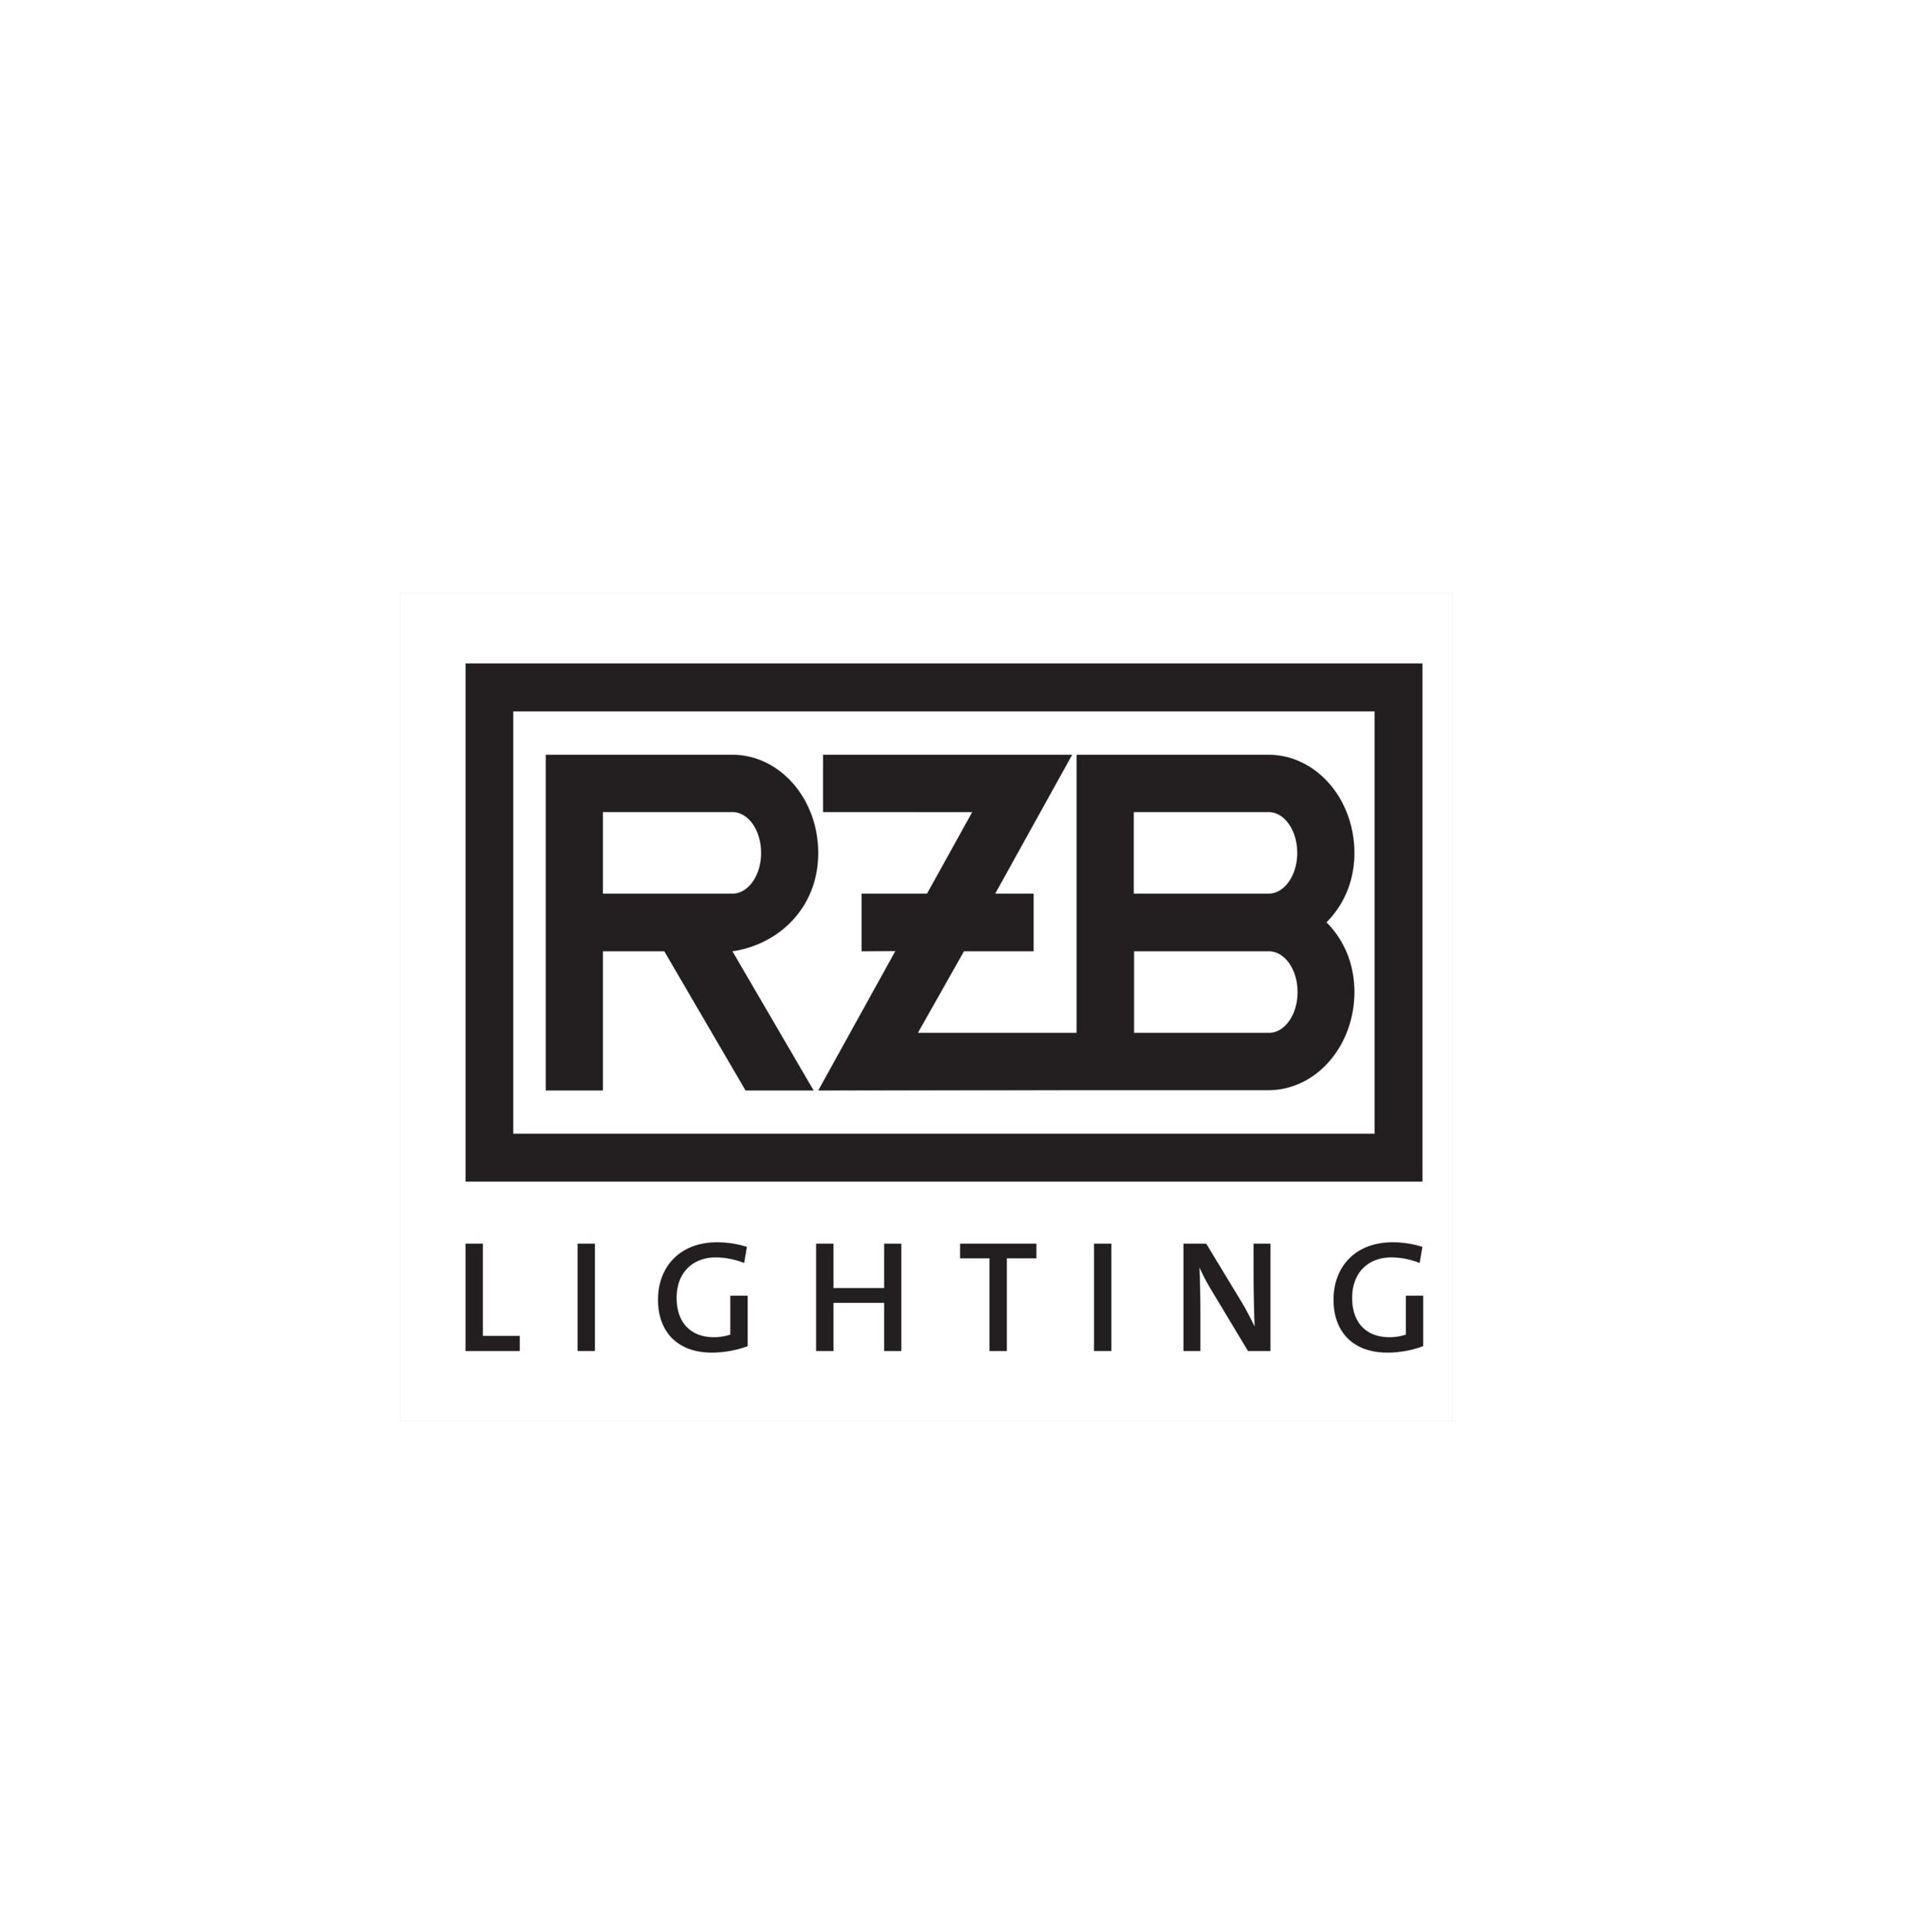 logo rzb.png